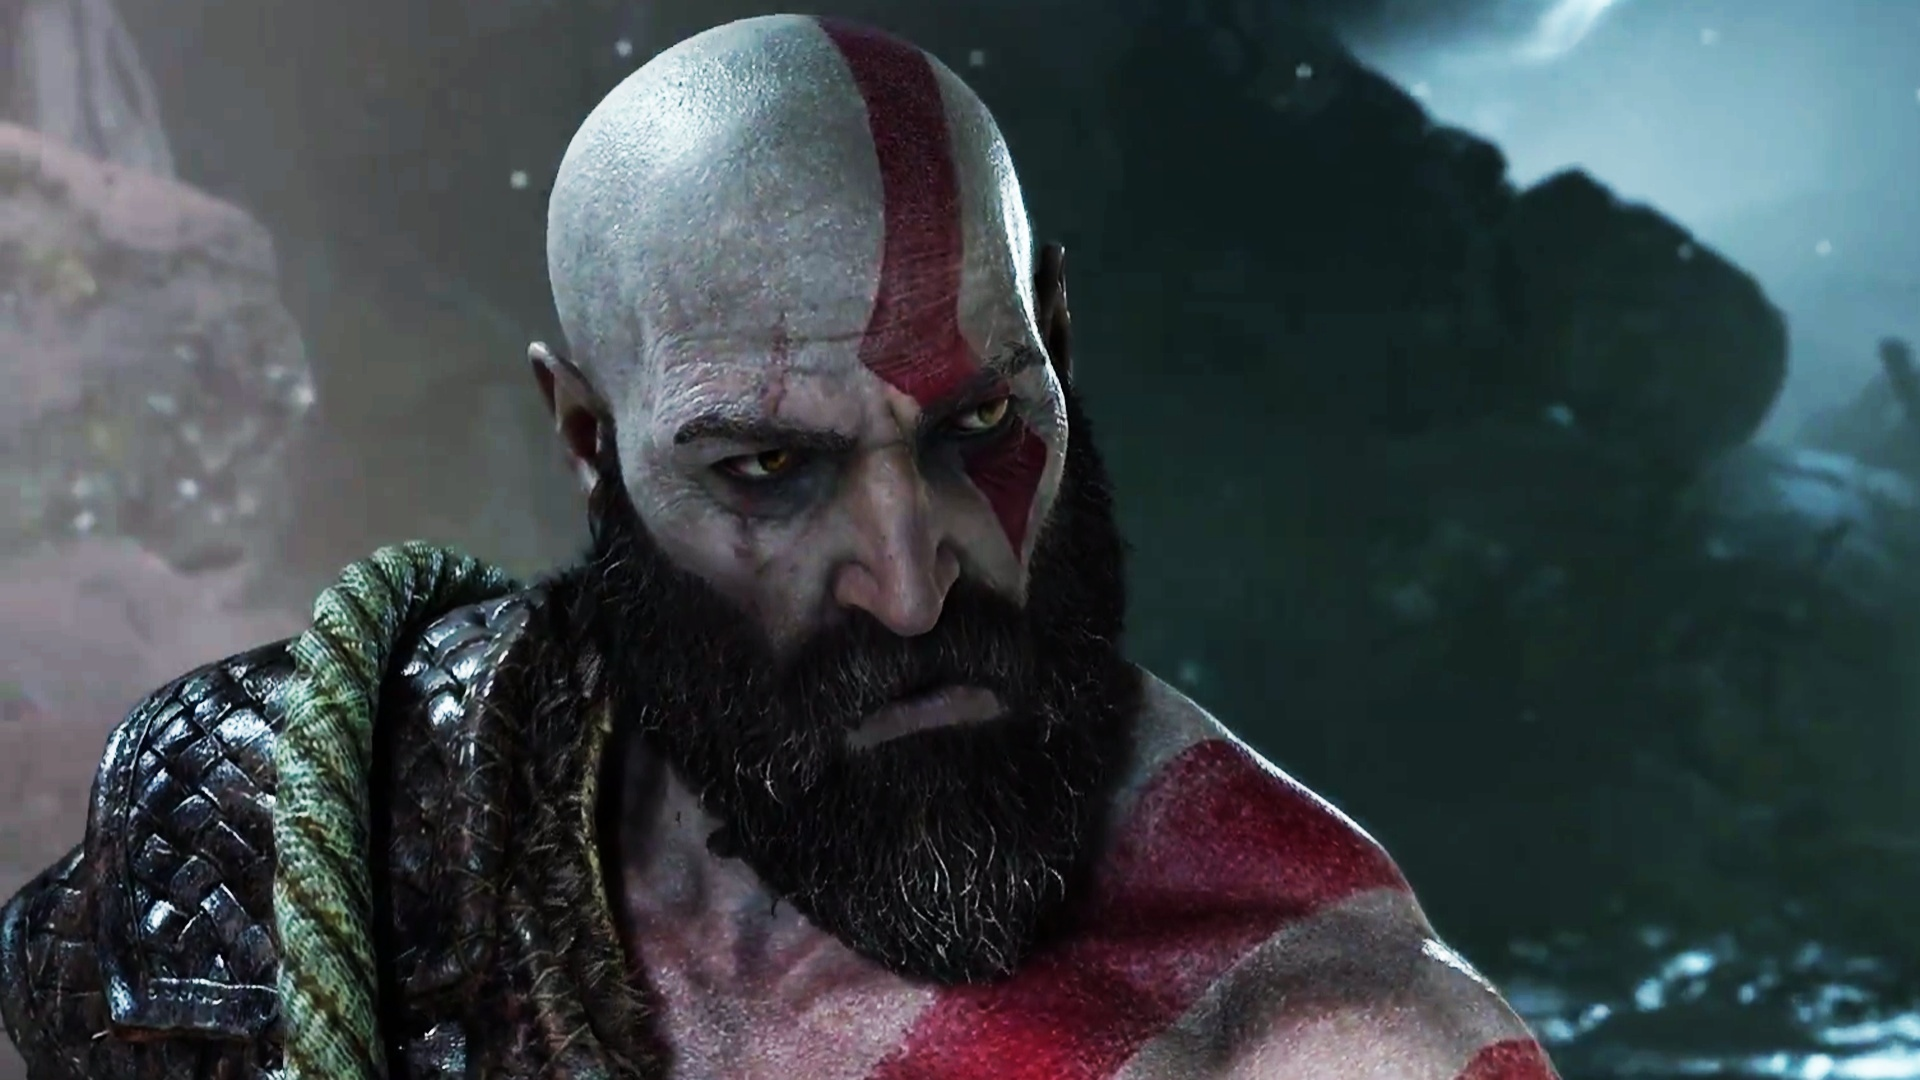 God Of War Offizielles Artwork Zeigt Kratos Atreus Im